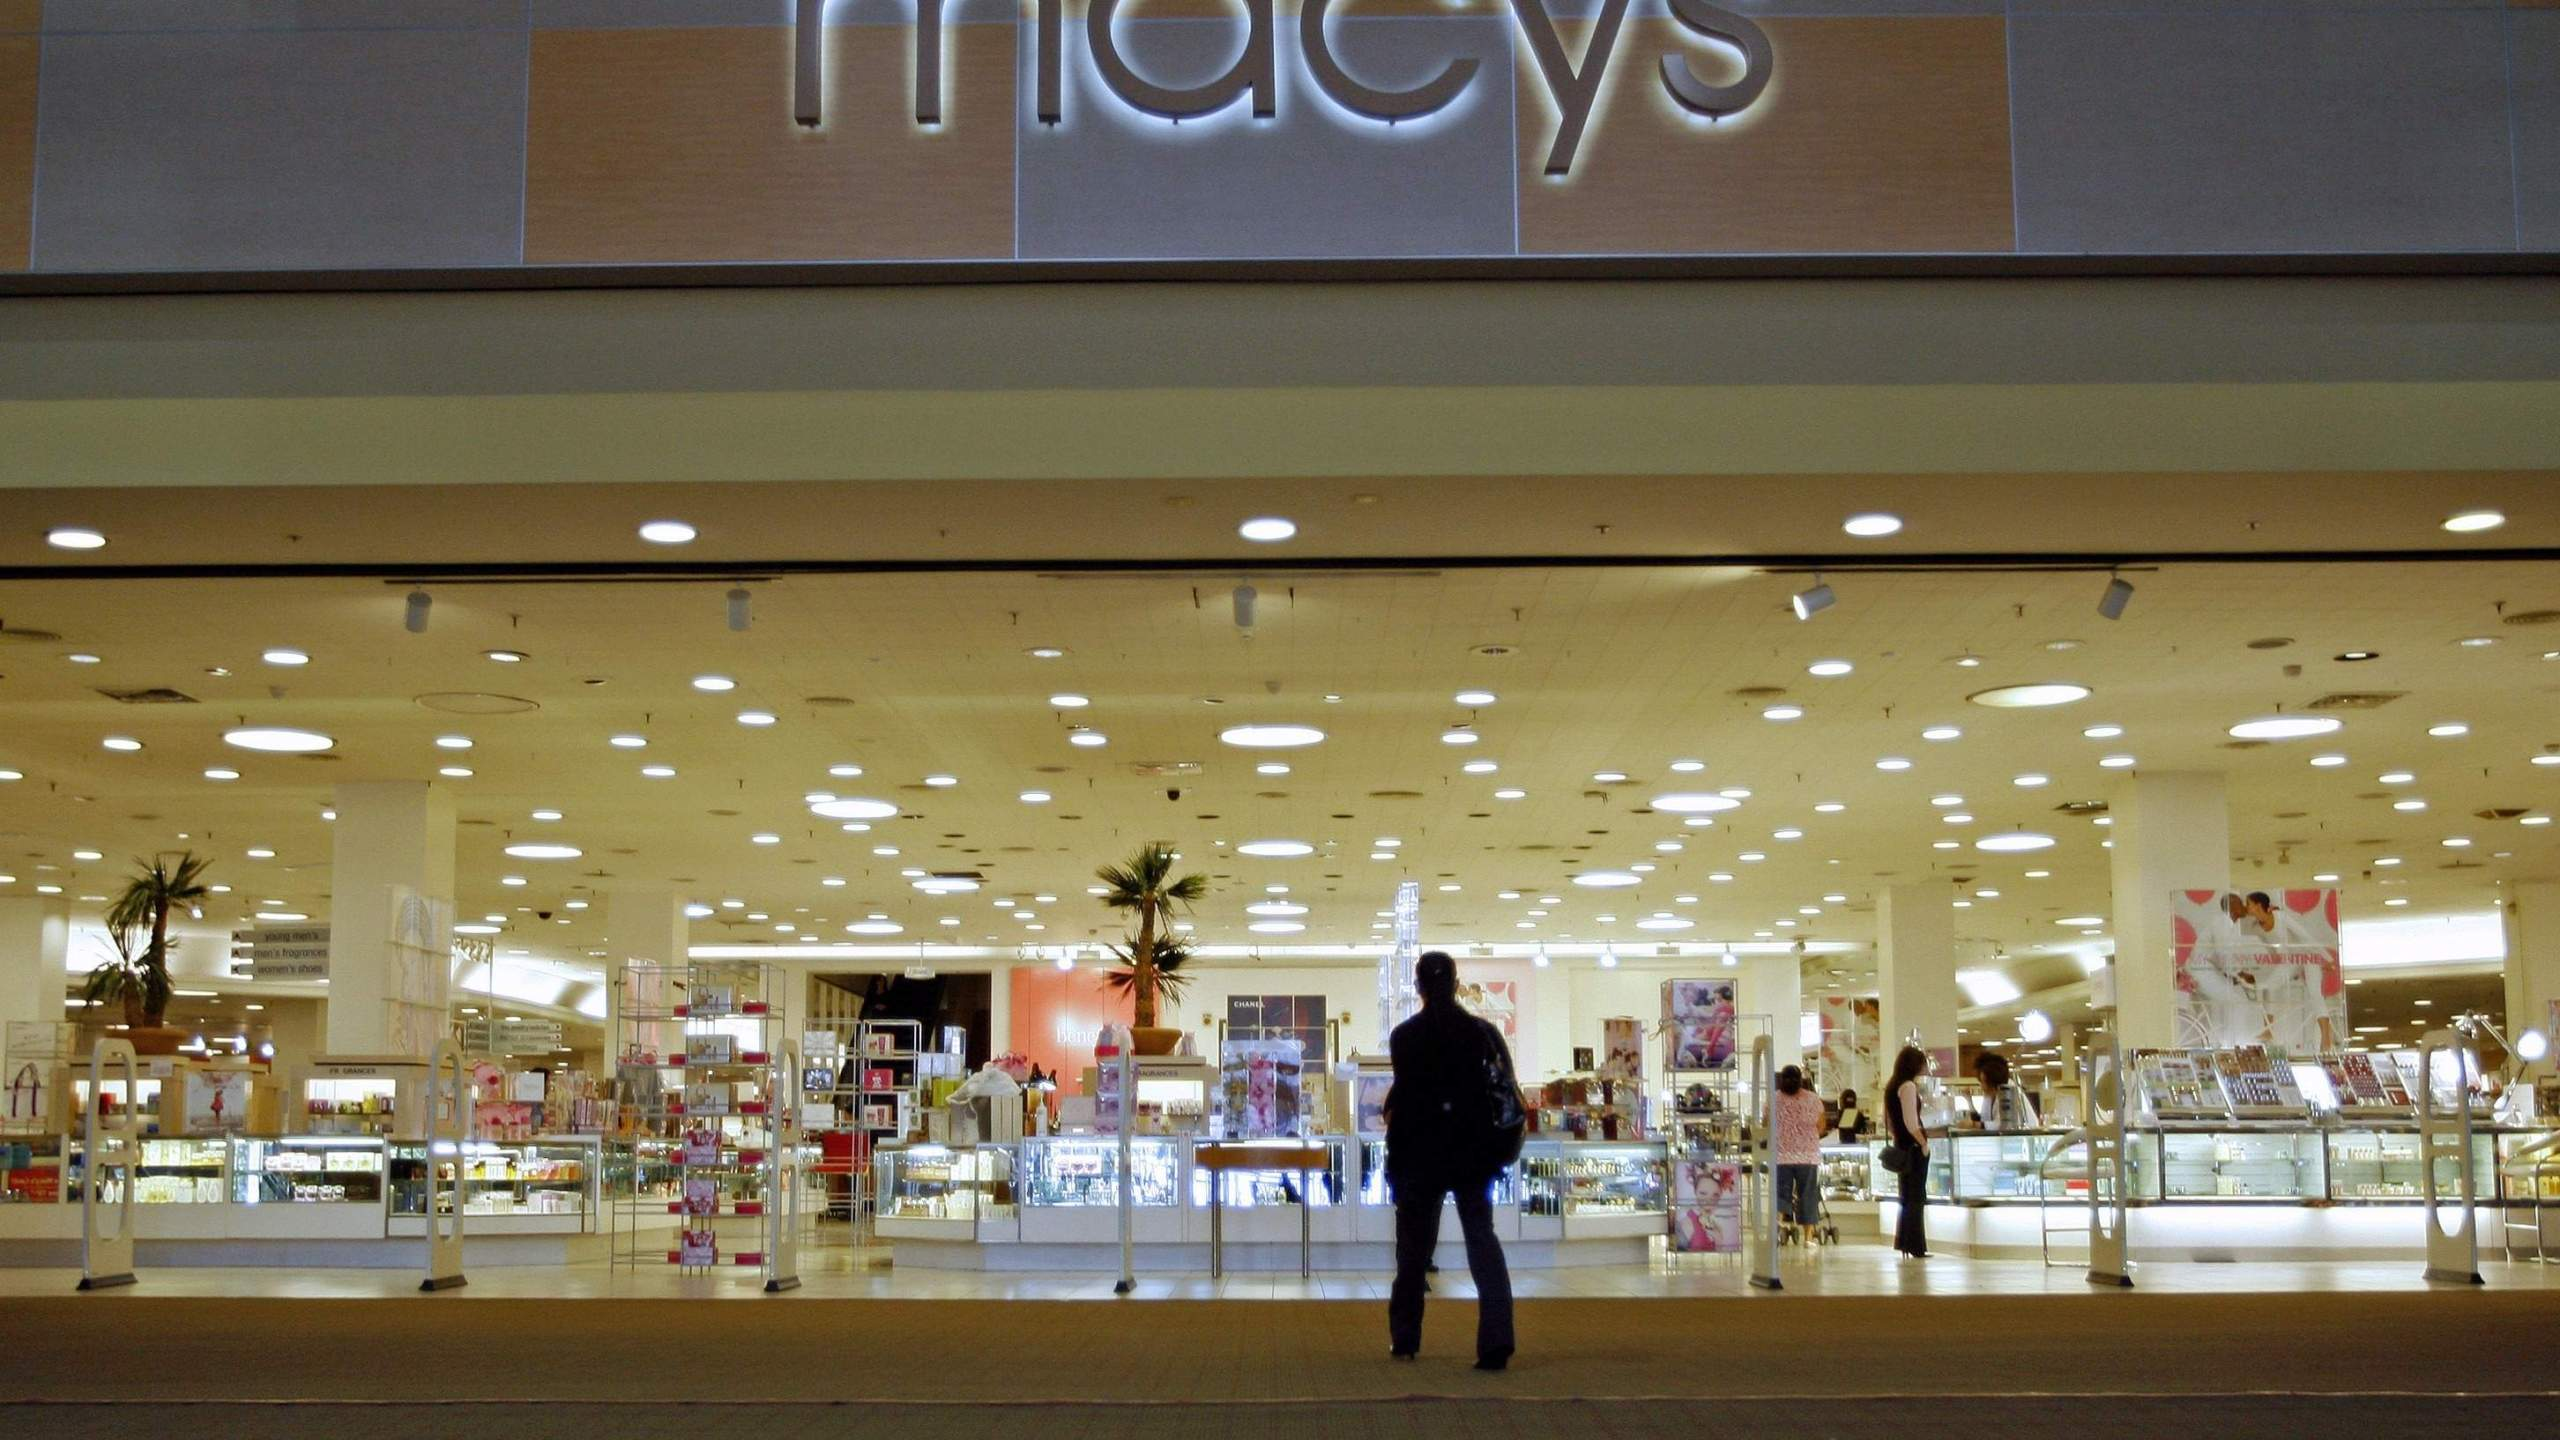 macys-storefront_196026